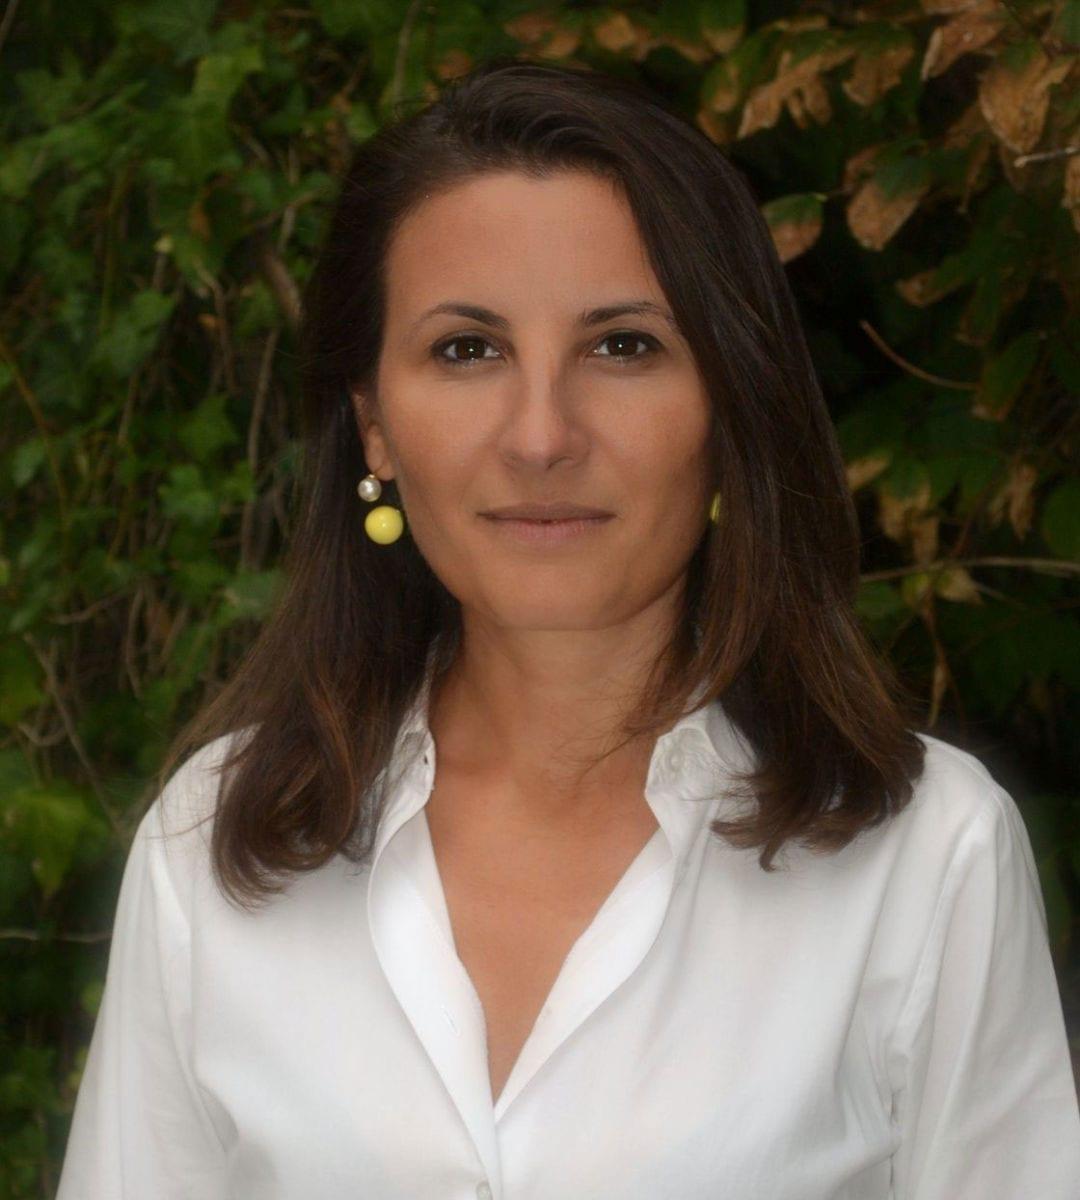 Pina Celardo